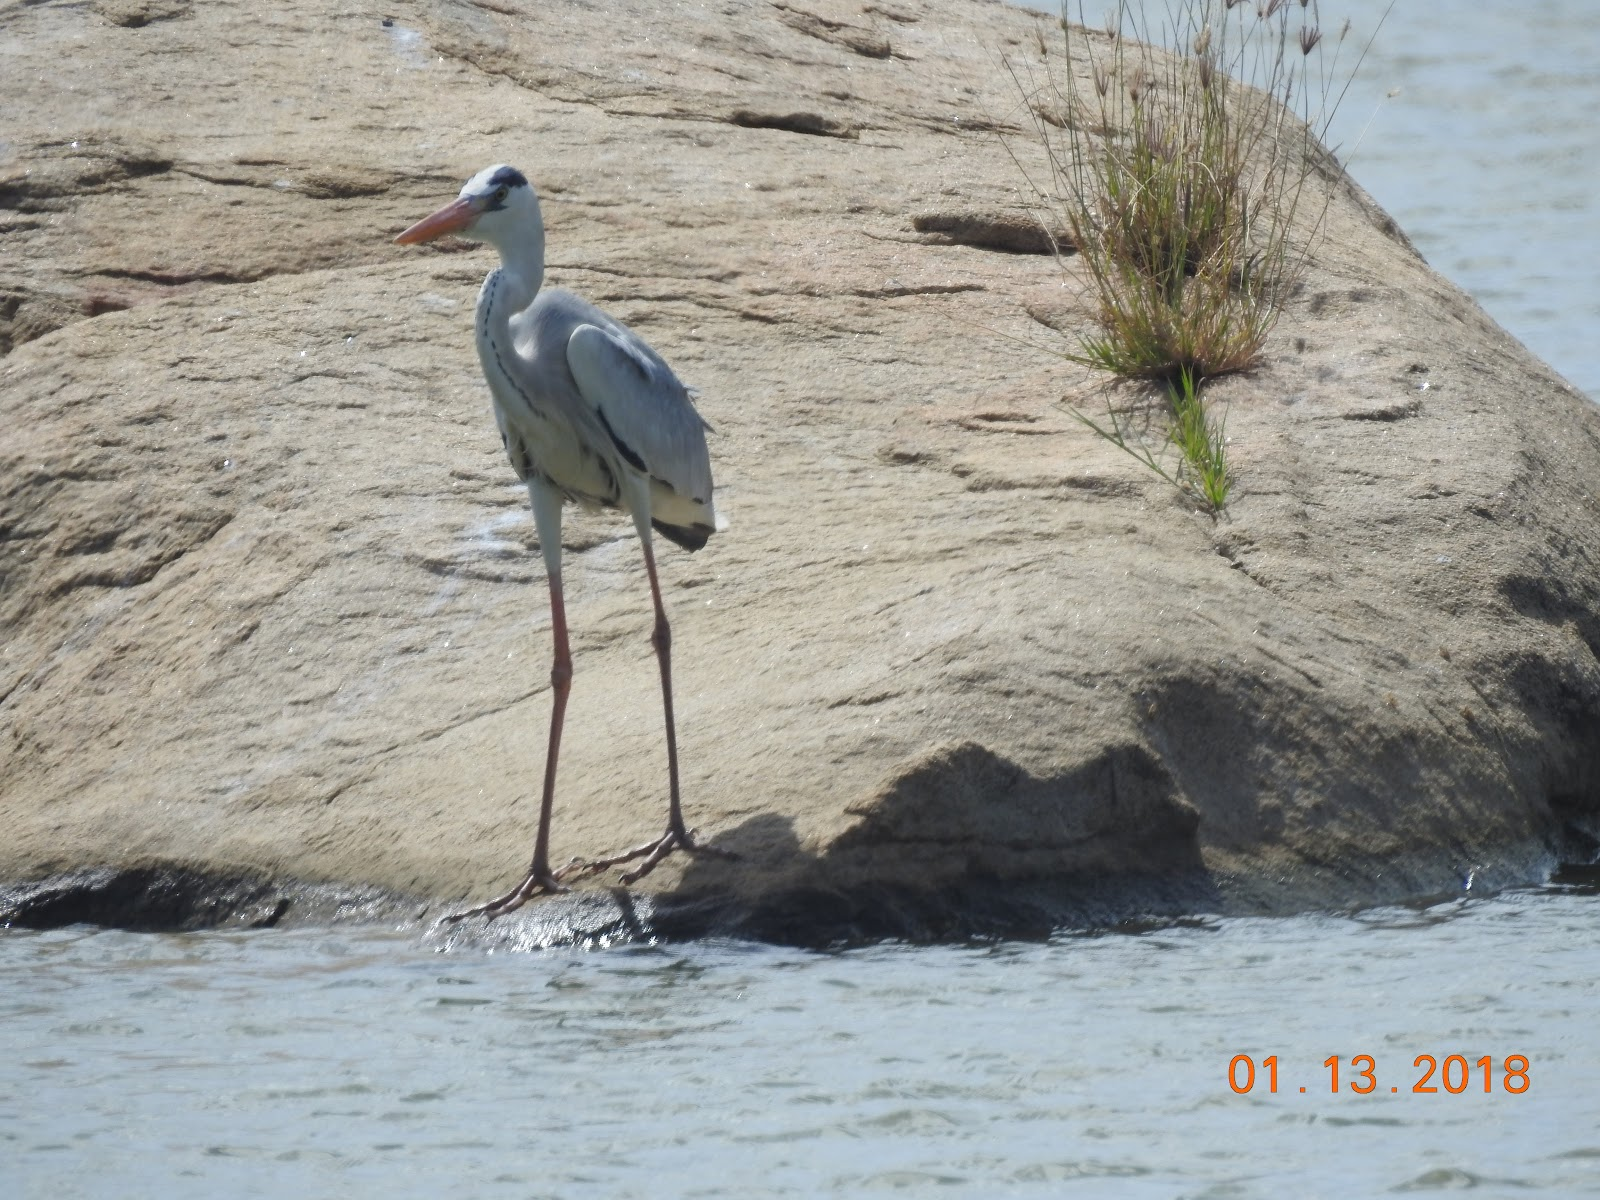 invite-to-paradise-sri-lanka-maldives-holiday-specialists-nutan-vidyut-patel-bird.jpg